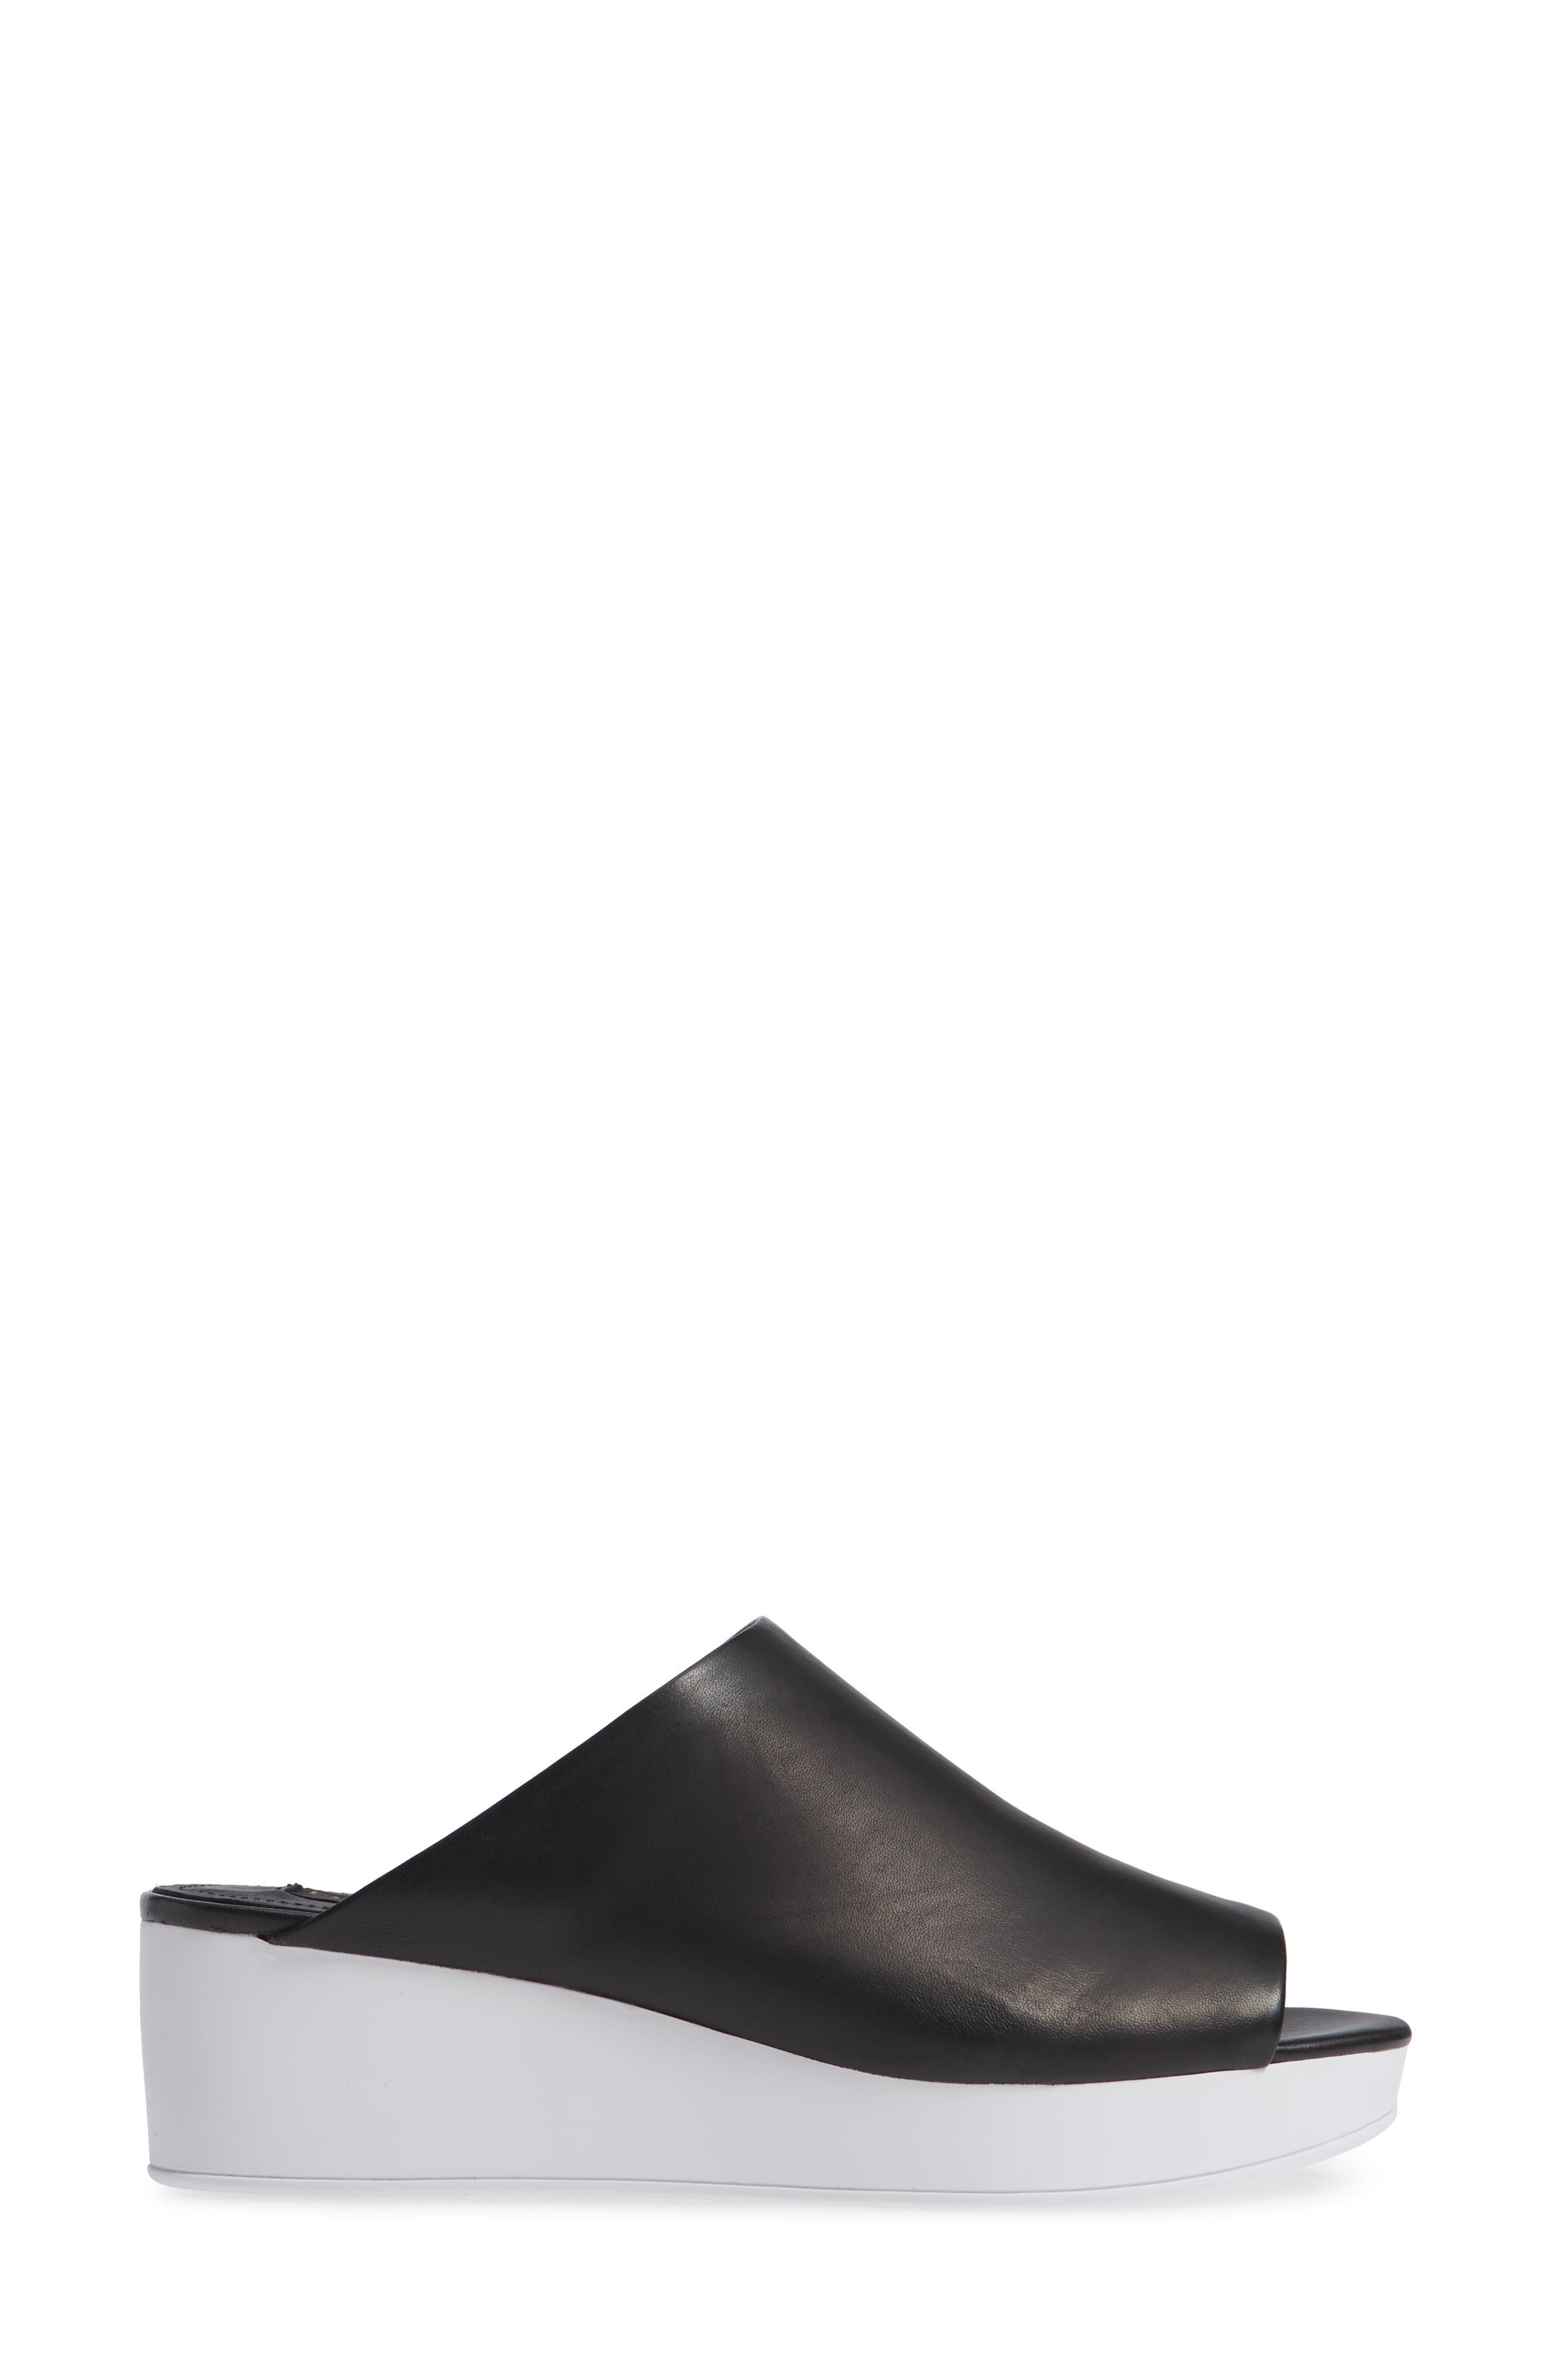 Donna Karan Reisley Wedge Slide Sandal,                             Alternate thumbnail 3, color,                             BLACK LEATHER